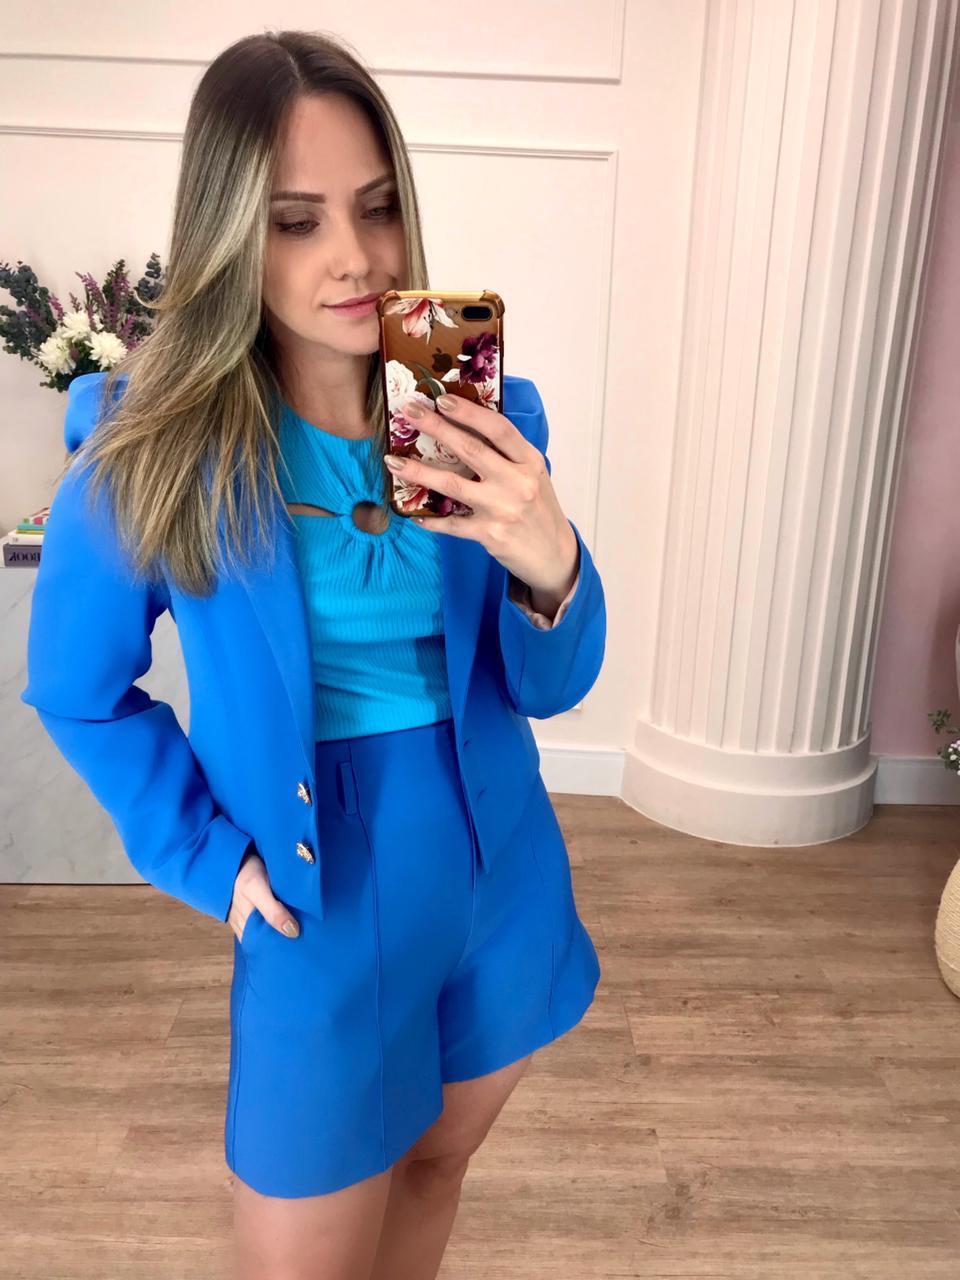 Shorts Julia Crepe Alfaiataria Cintura Alta (Forro) Levemente Evasê Detalhe Vinco Passantes Fivela Metal 5% Elastano